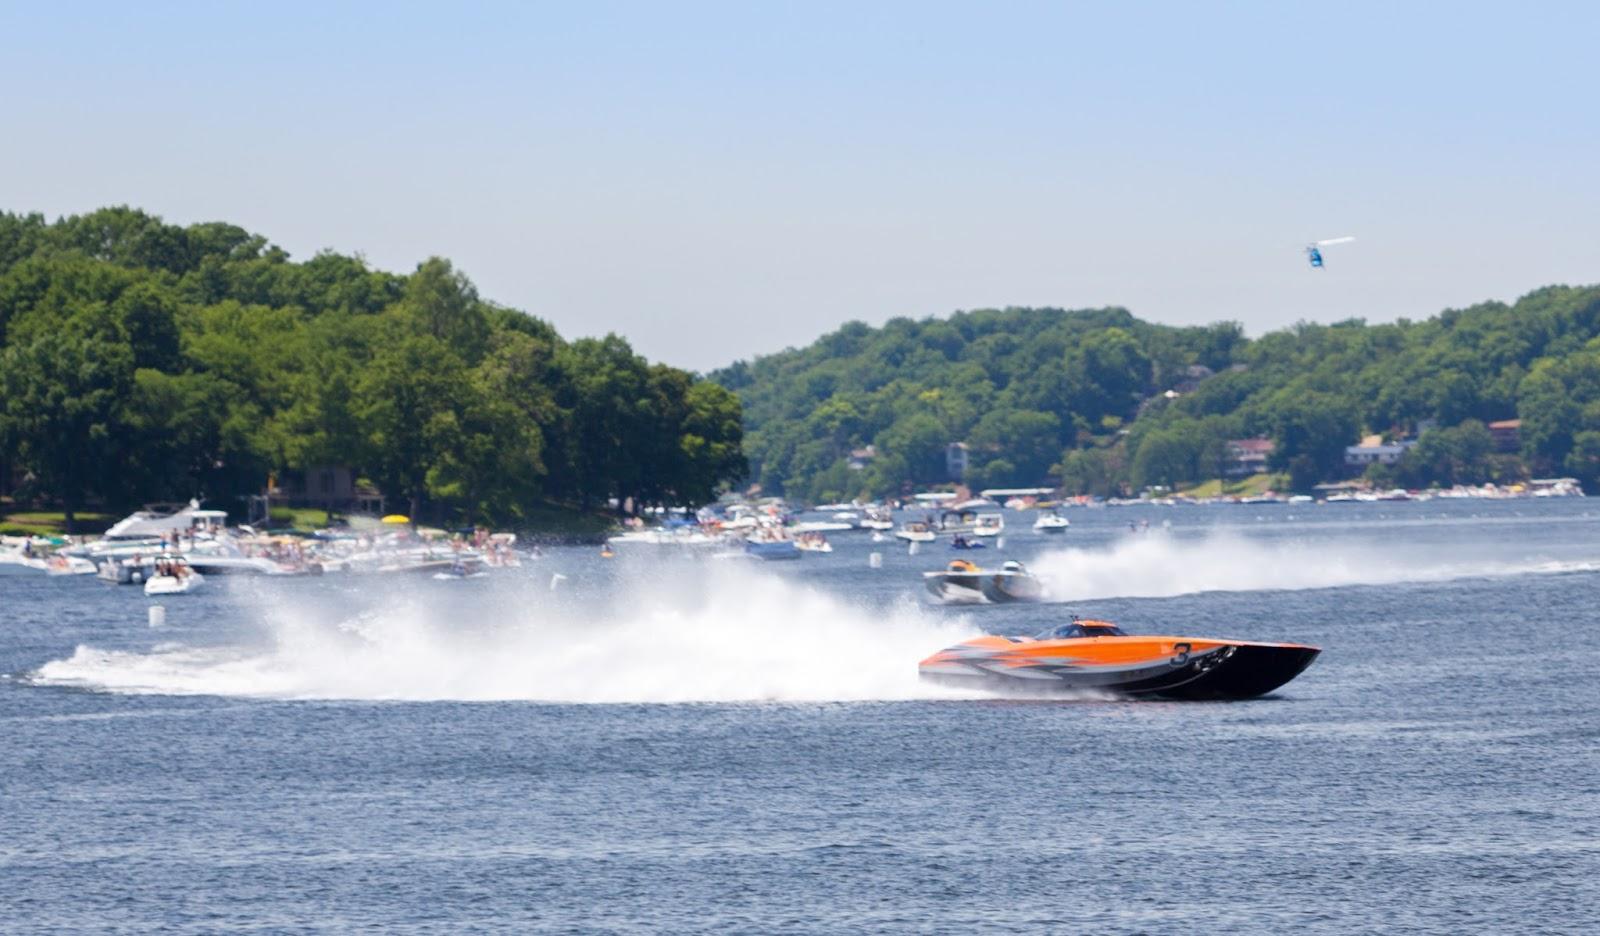 Surdyke Yamaha & Marina: Lake Race 2015!